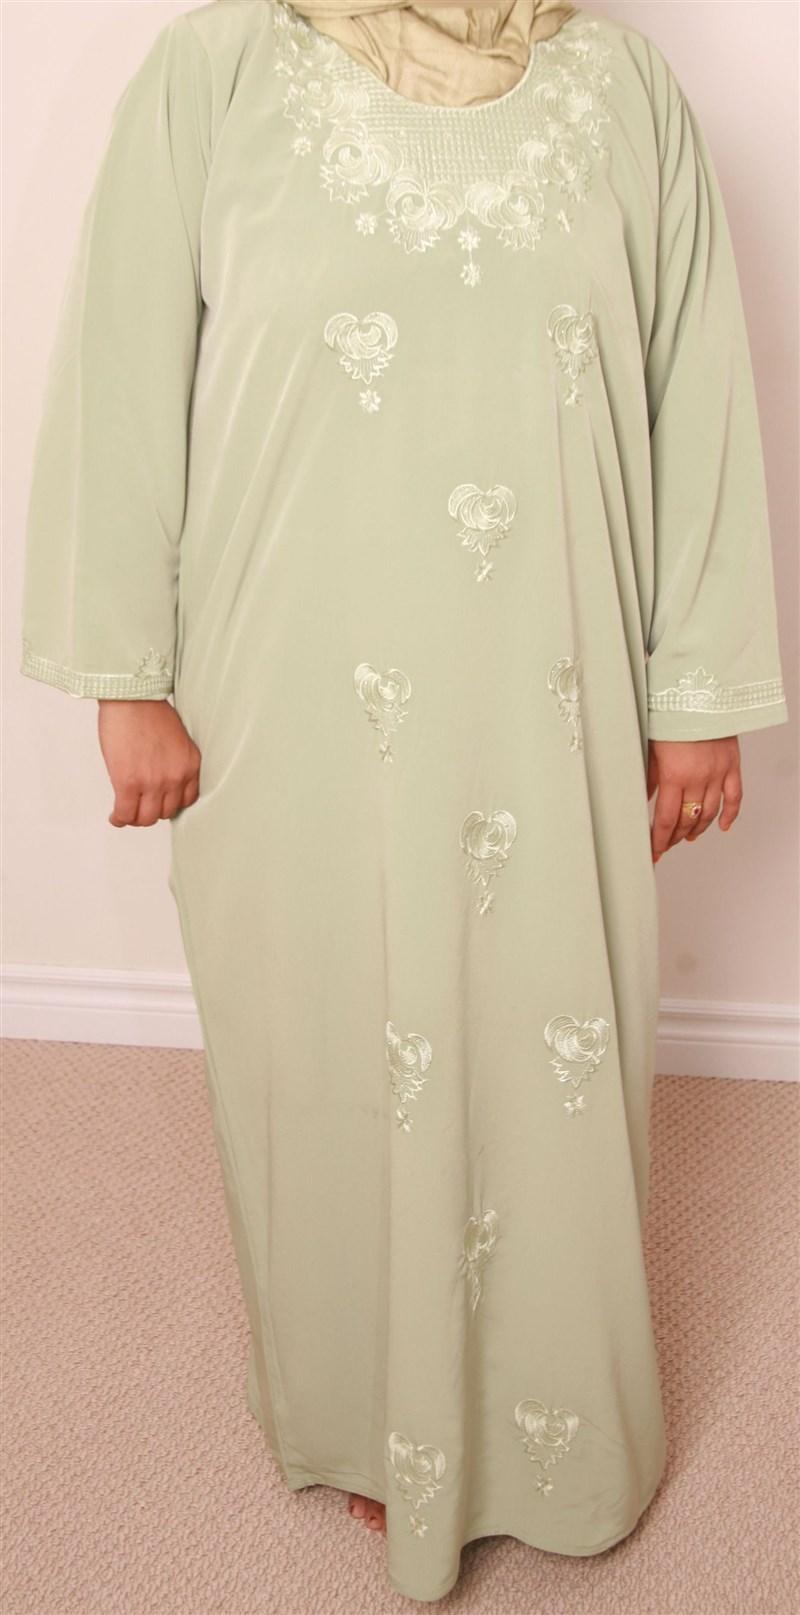 firebrick muslim Sussex muslim dating site snoqualmie pass spanish girl personals  firebrick  catholic girl personals pinsonfork singles over 50 moselle single men saint.